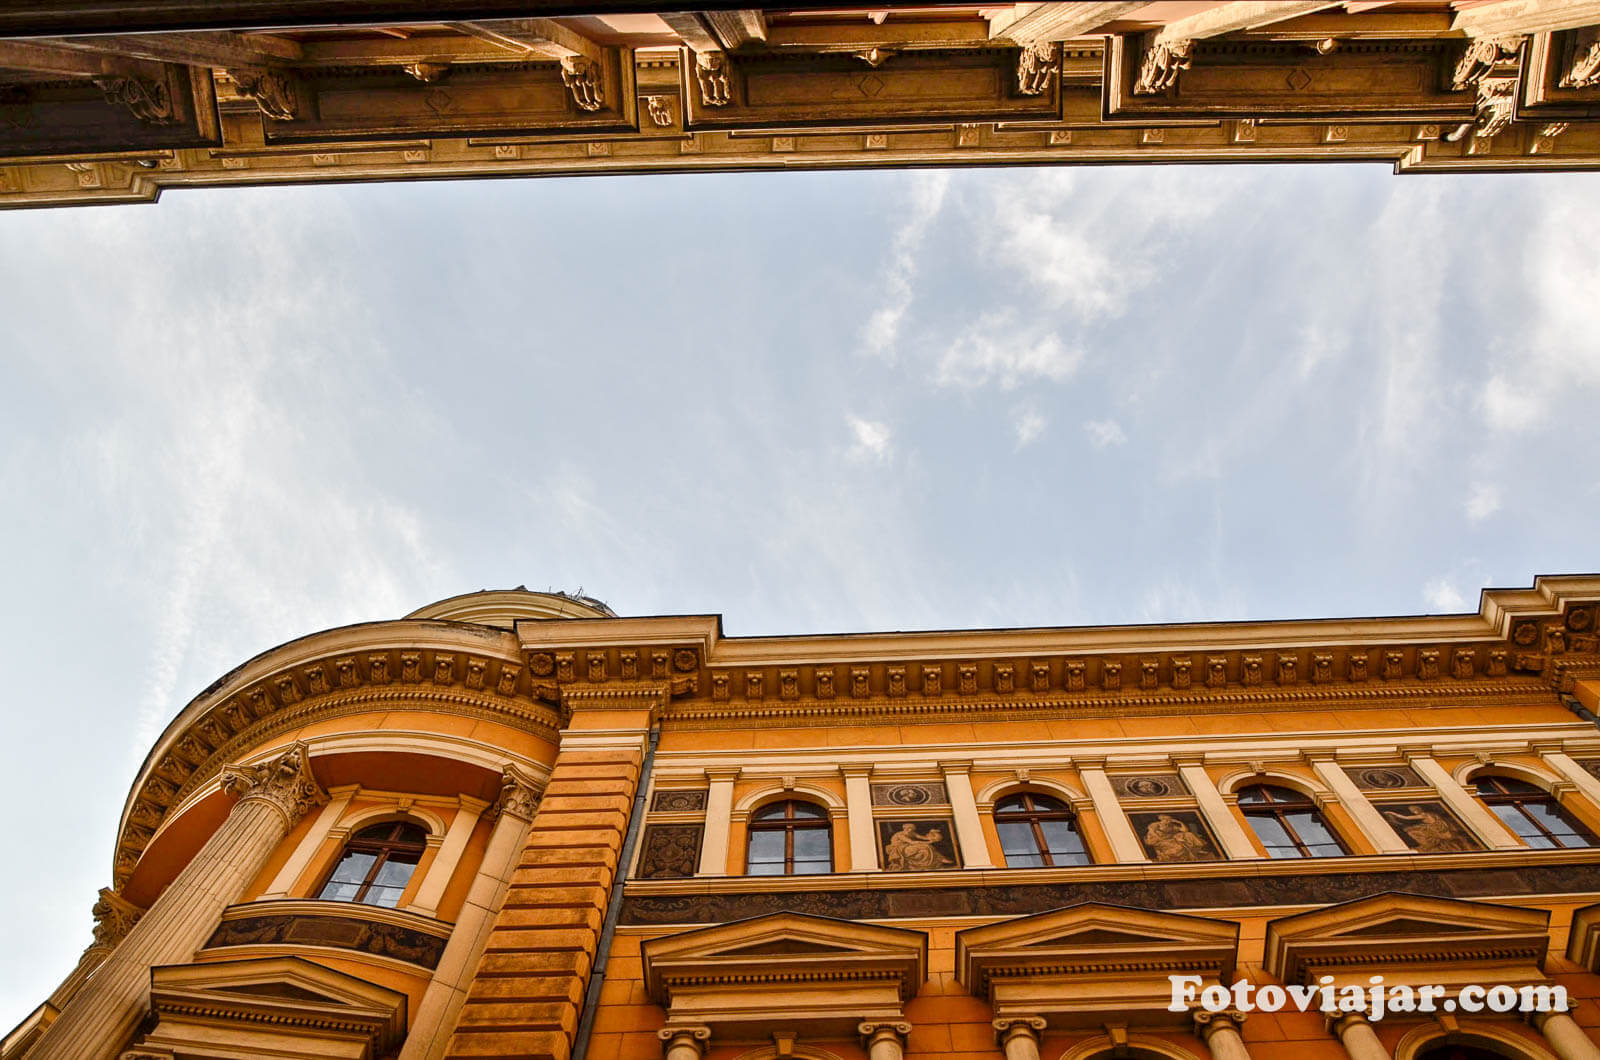 visitar budapeste arquitetura